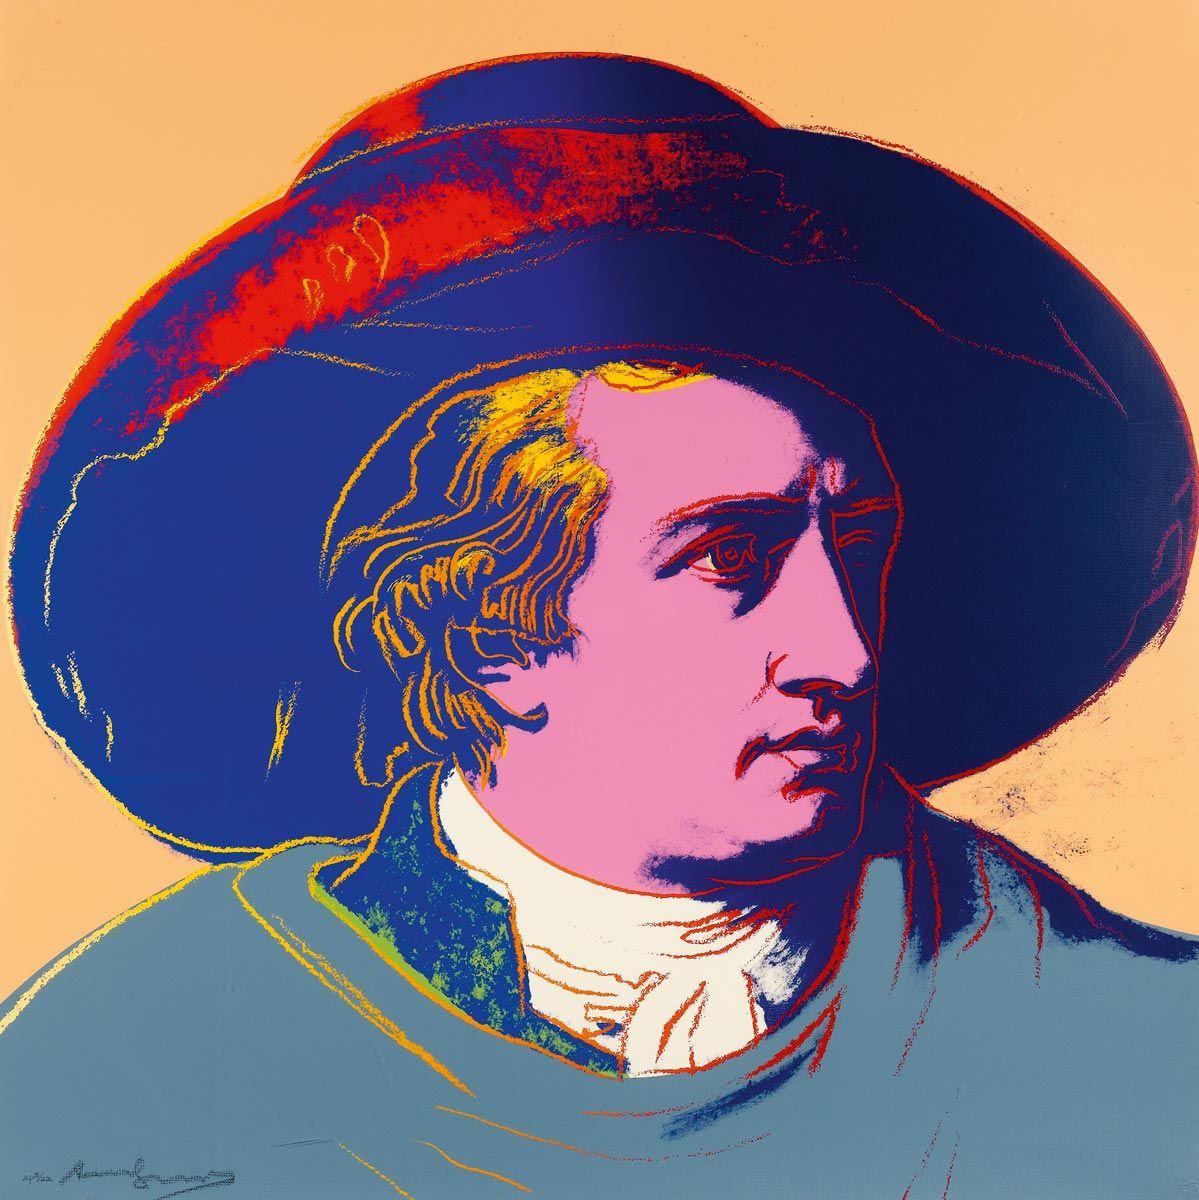 Andy Warhol, Goethe, 1982